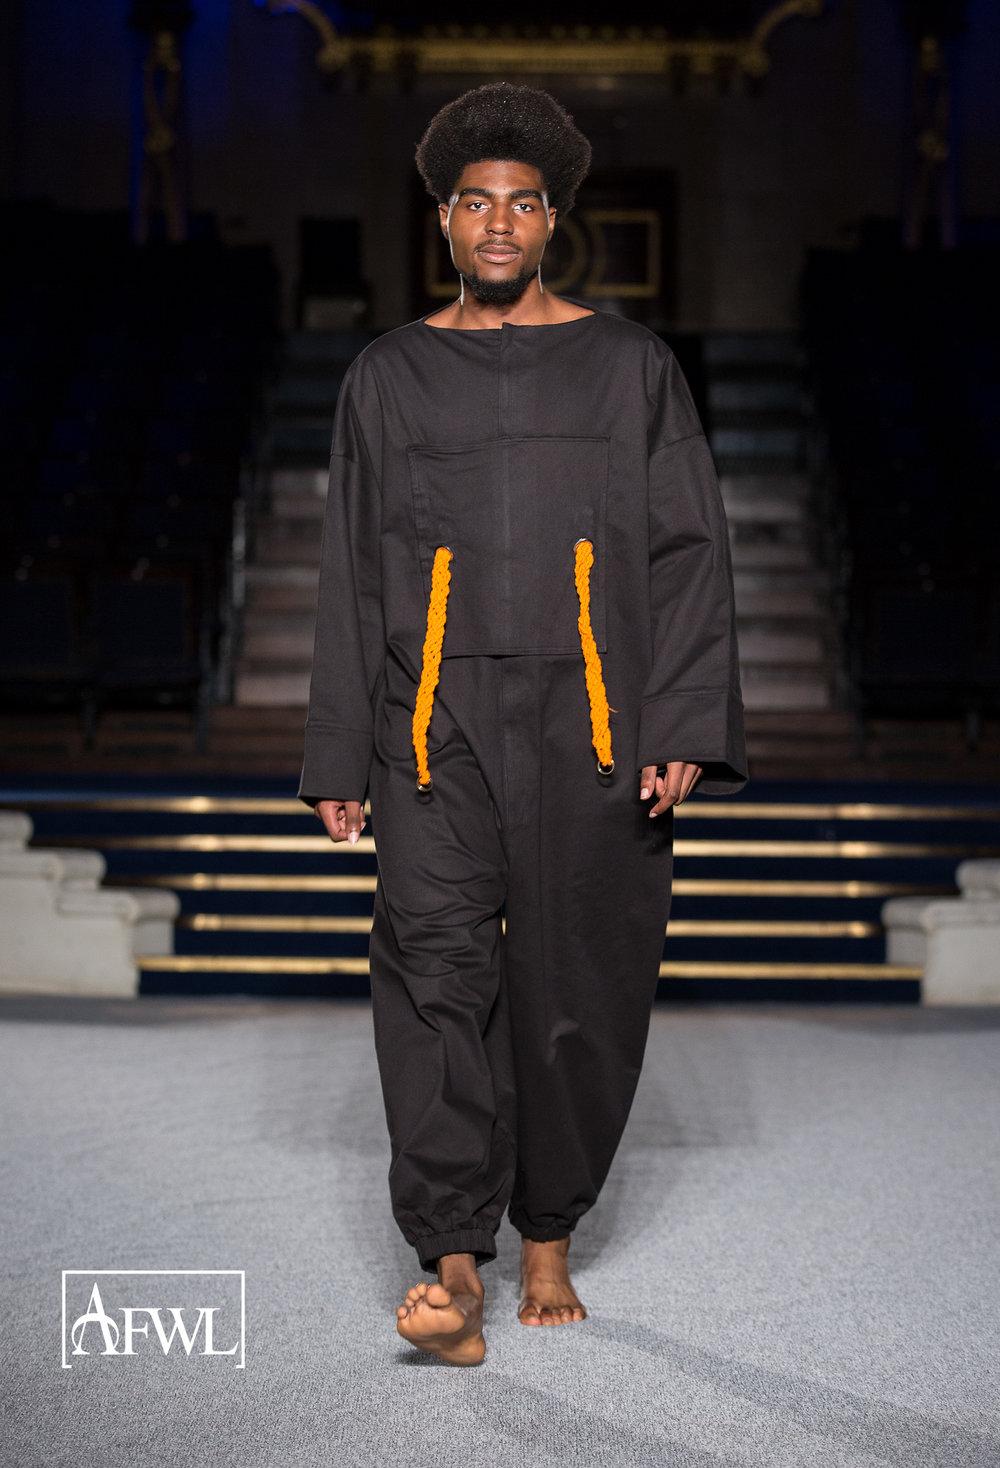 Ibrahim Musa - Joanna Mitroi Photography0082.jpg